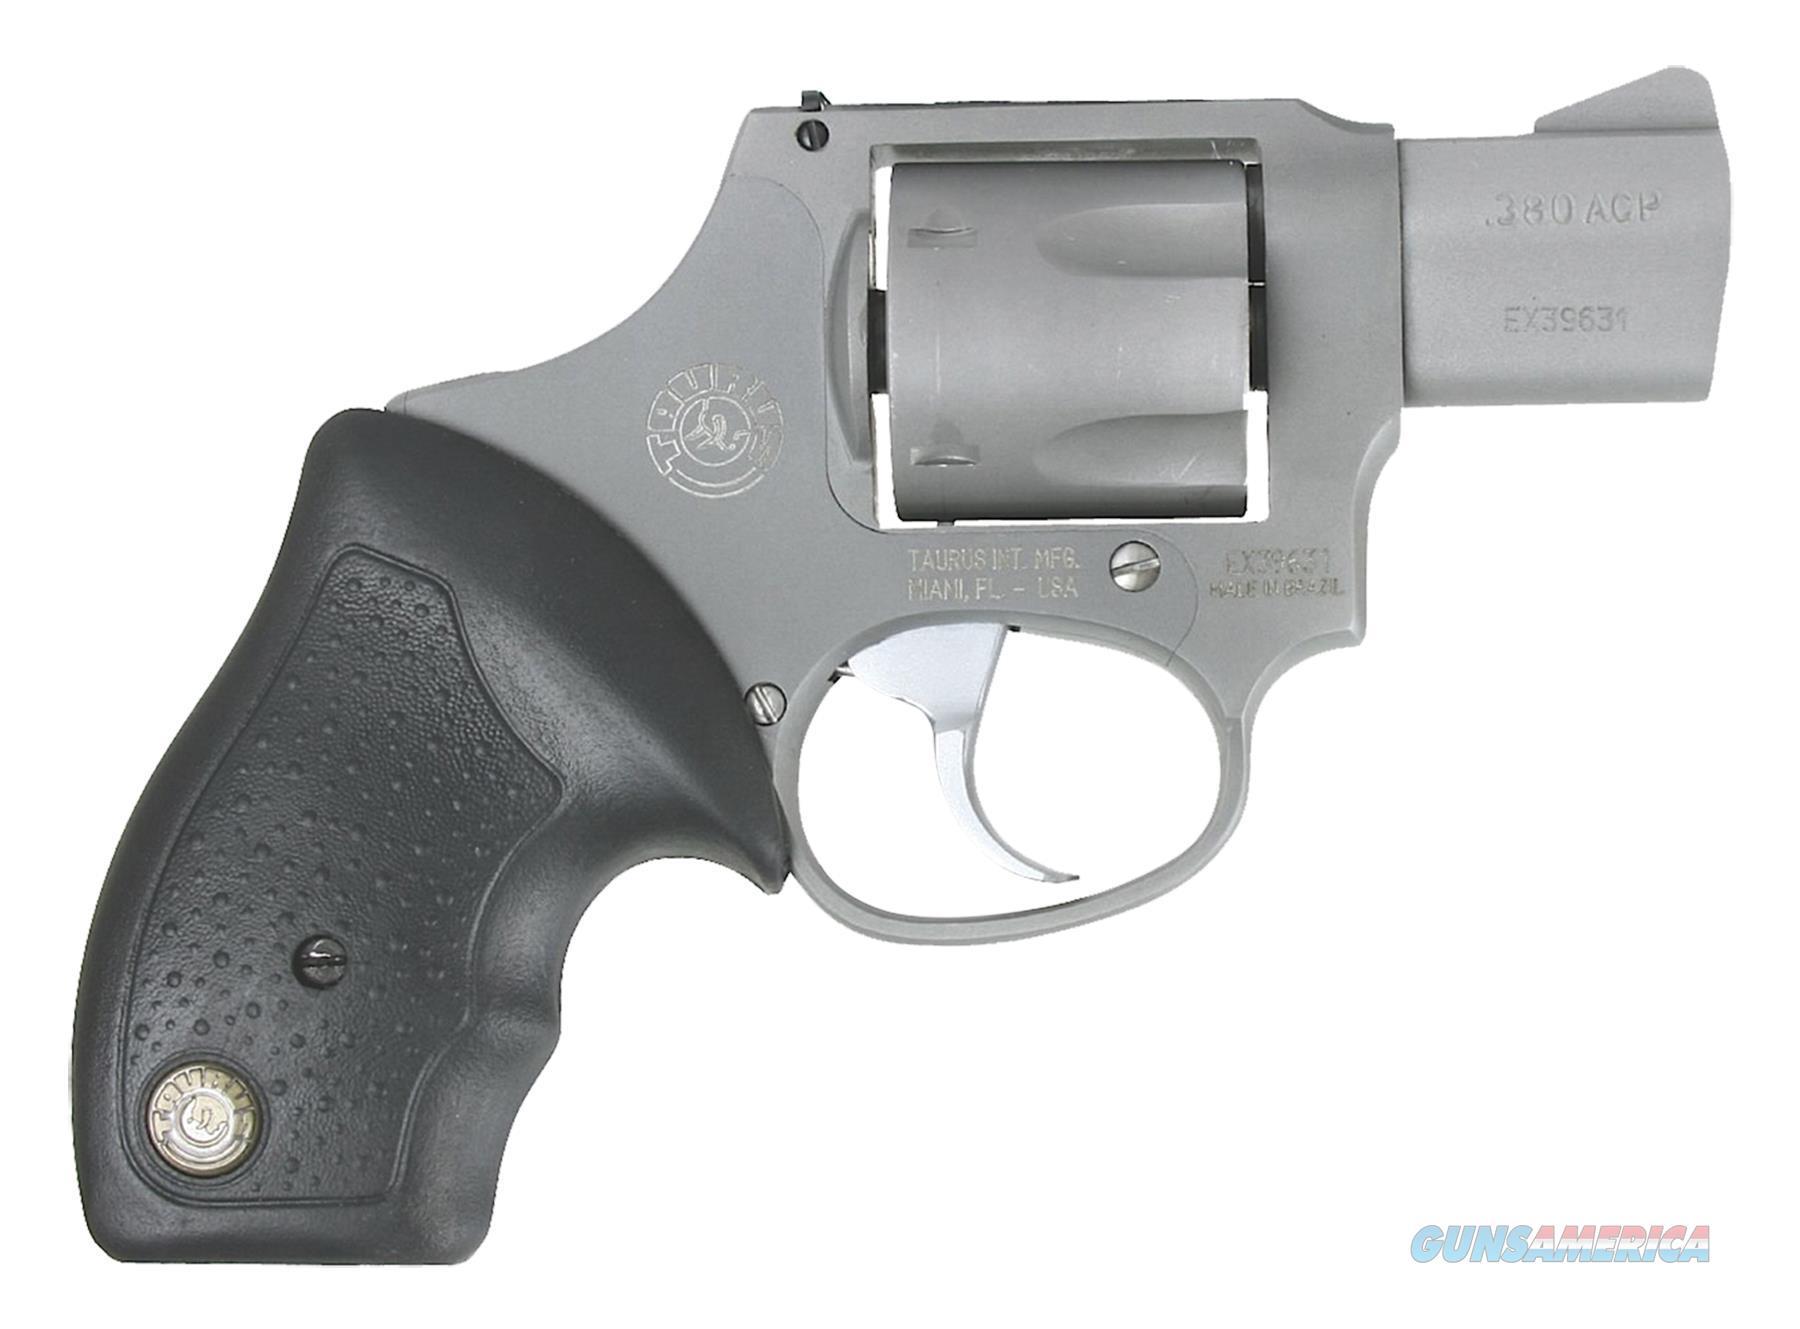 "Taurus 2380129Ul 380 Mini Revolver Double 380 Automatic Colt Pistol (Acp) 1.75"" 5 Rd Black Rubber Grip Stainless 2-380129UL  Guns > Pistols > TU Misc Pistols"